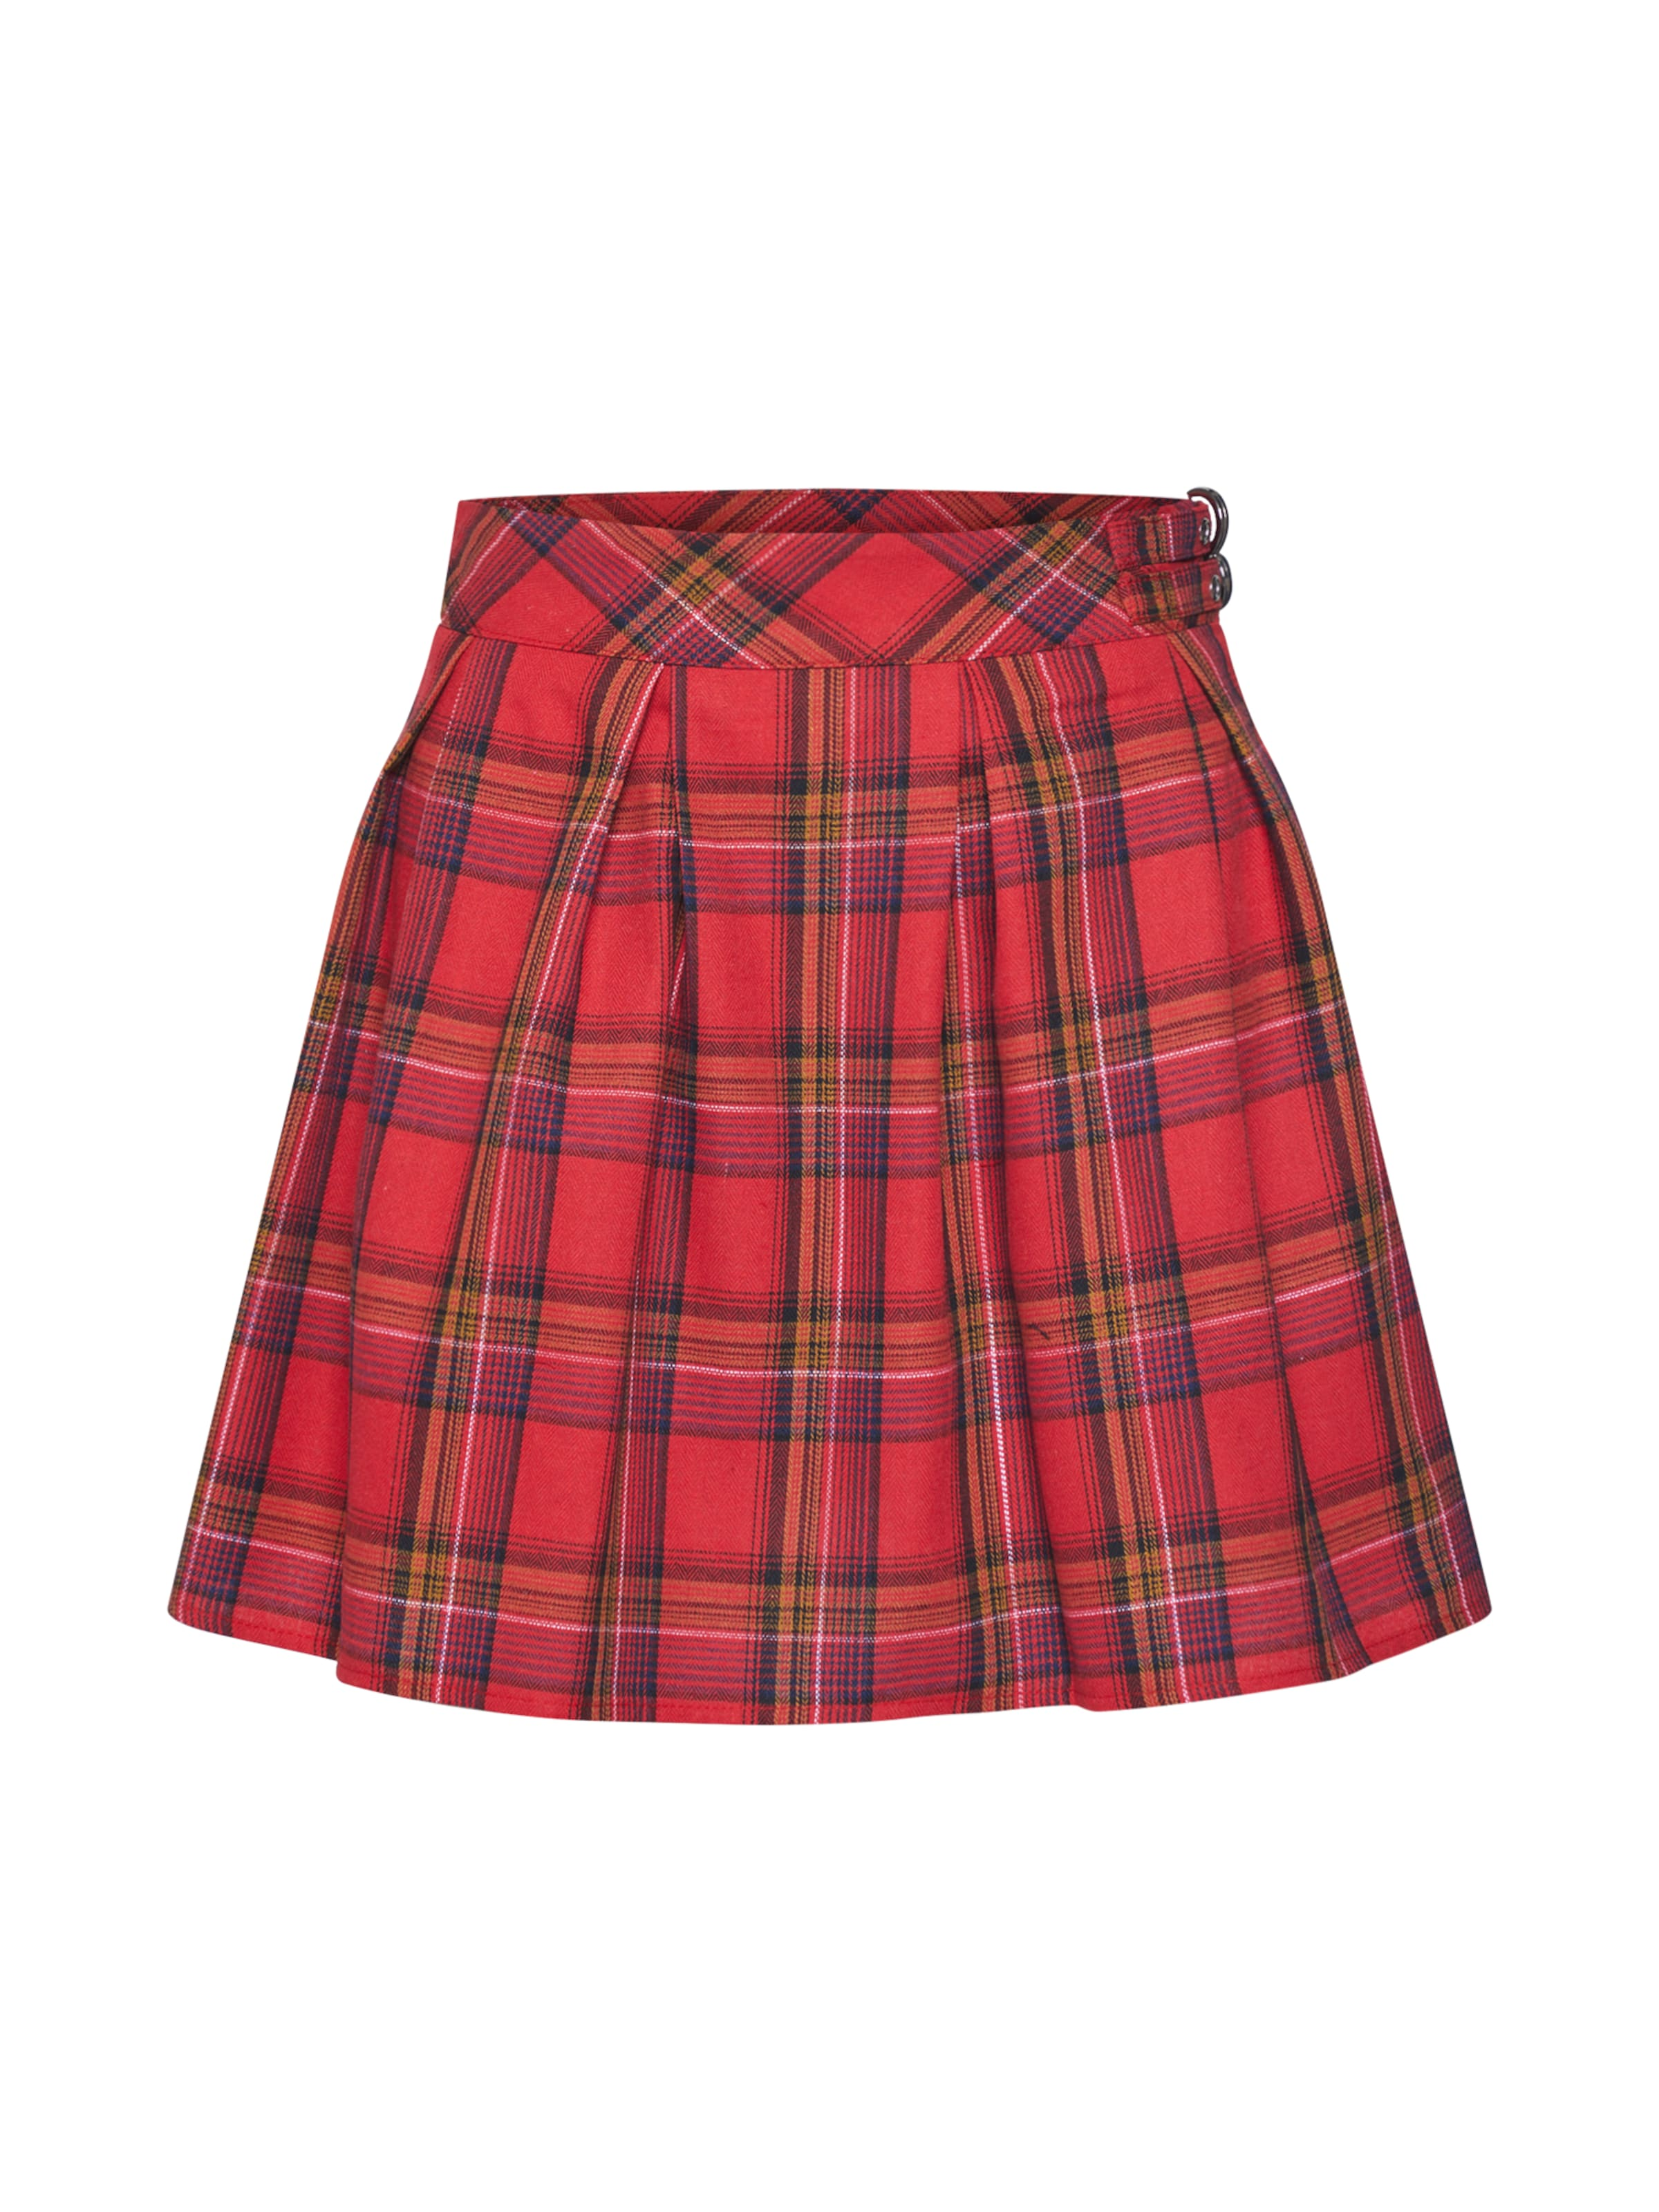 Buckle Detail En Mini Skirt' Jupe 'check Missguided RougeNoir Pleated W9H2YEDI